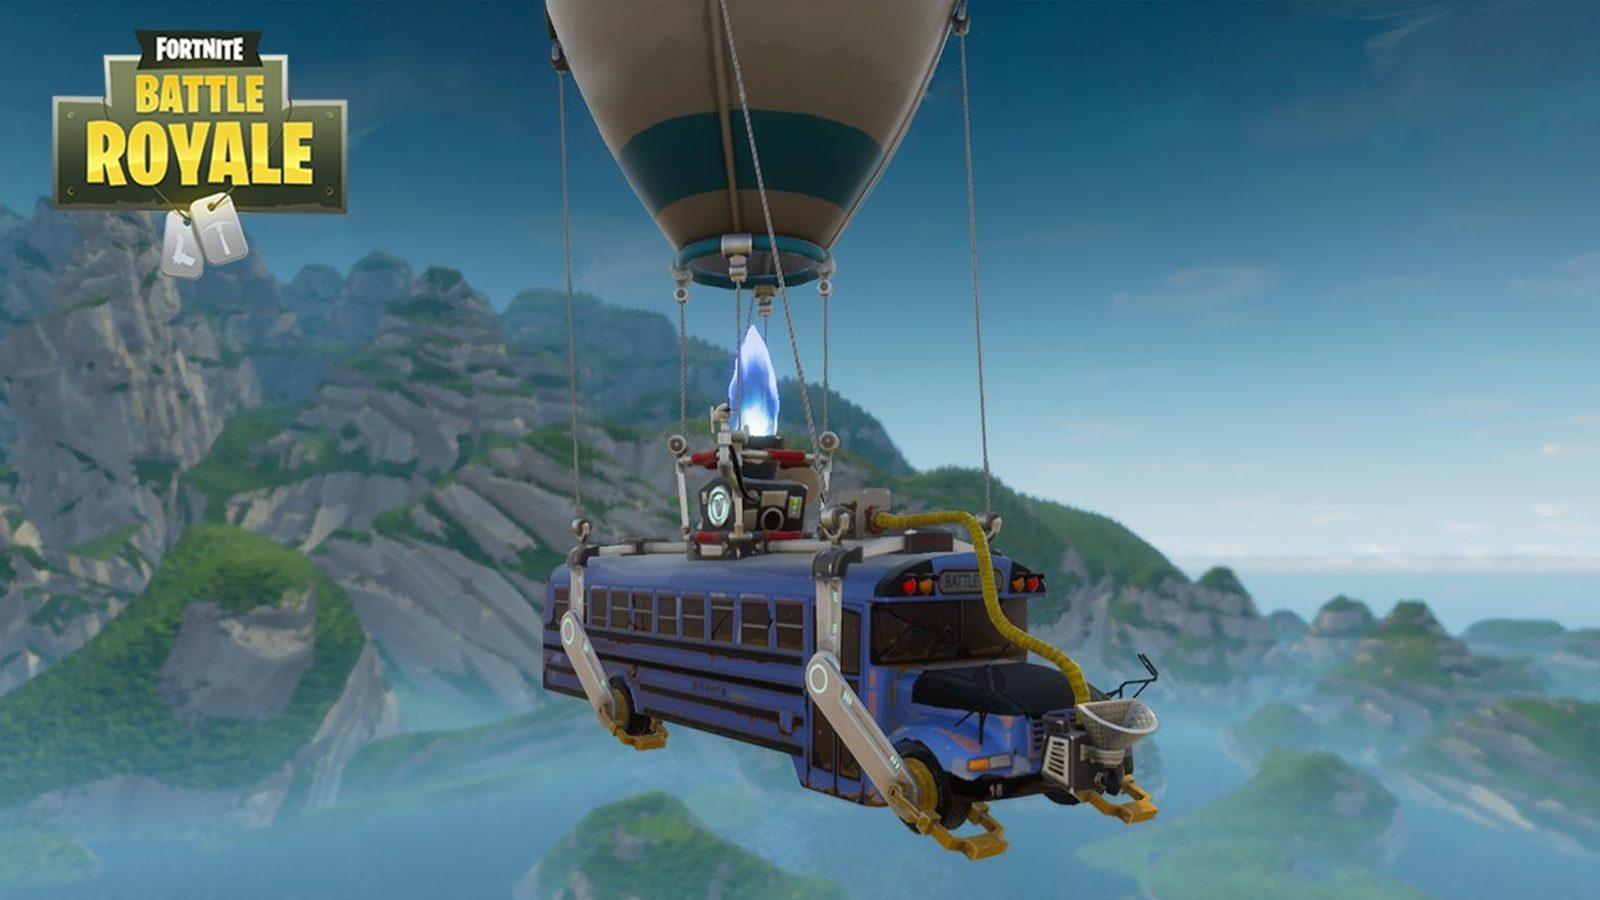 Fortnite Battle Bus Hot Air Balloon Appears Ready for E3